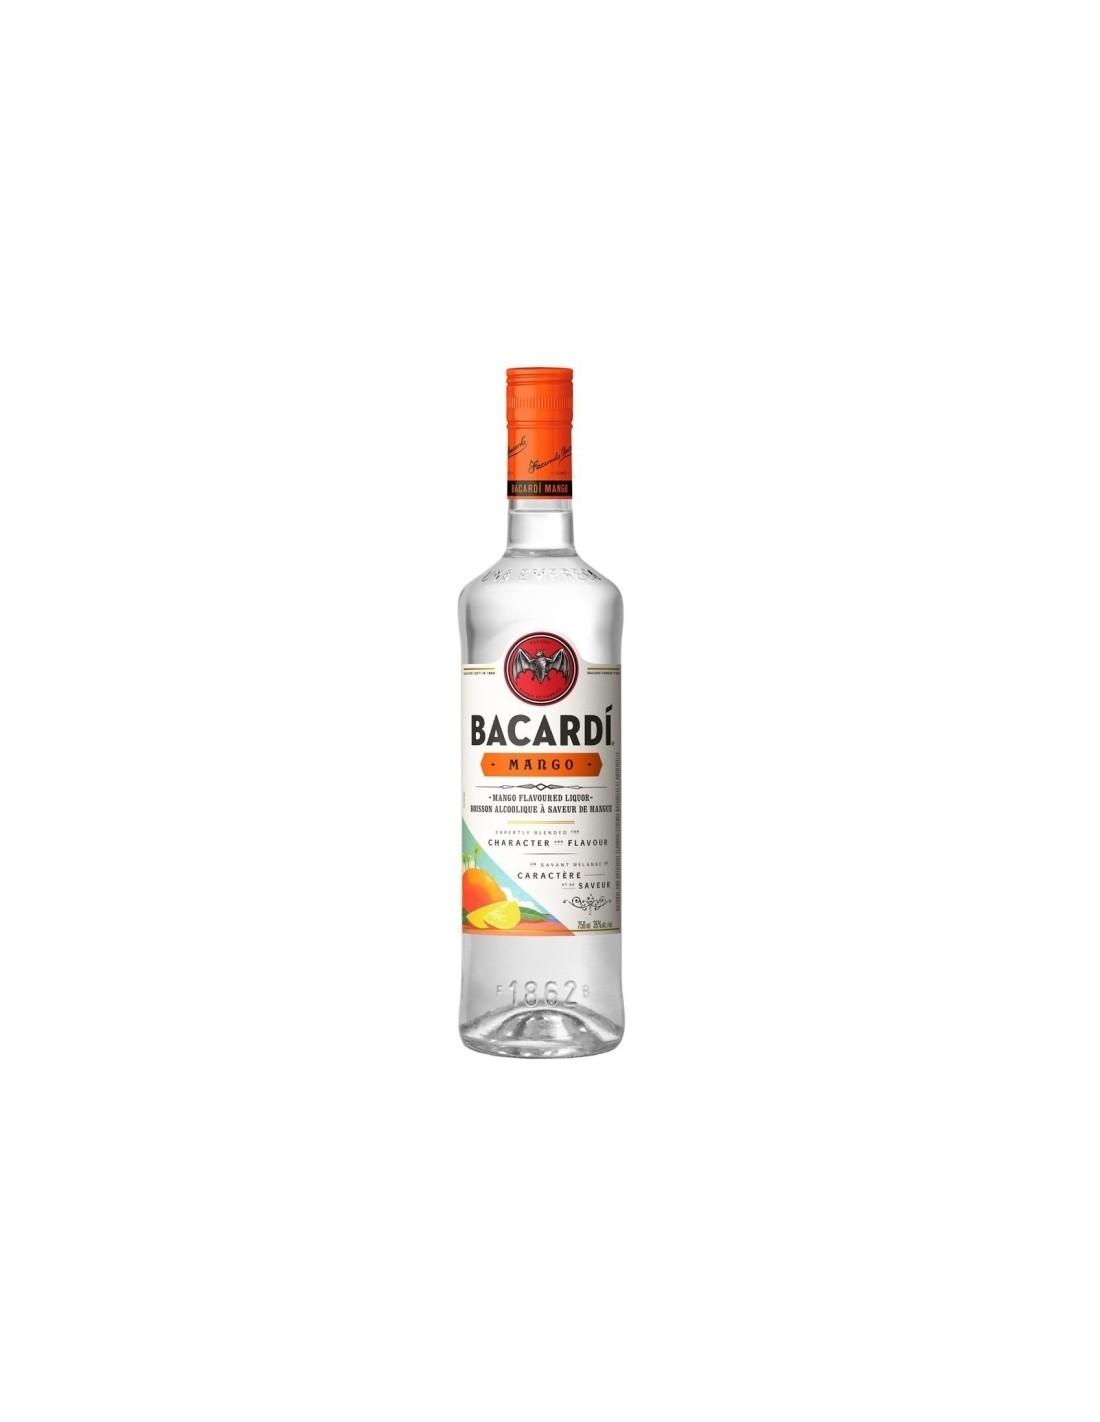 Rom Bacardi Mango, 1L, 32% alc., Cuba